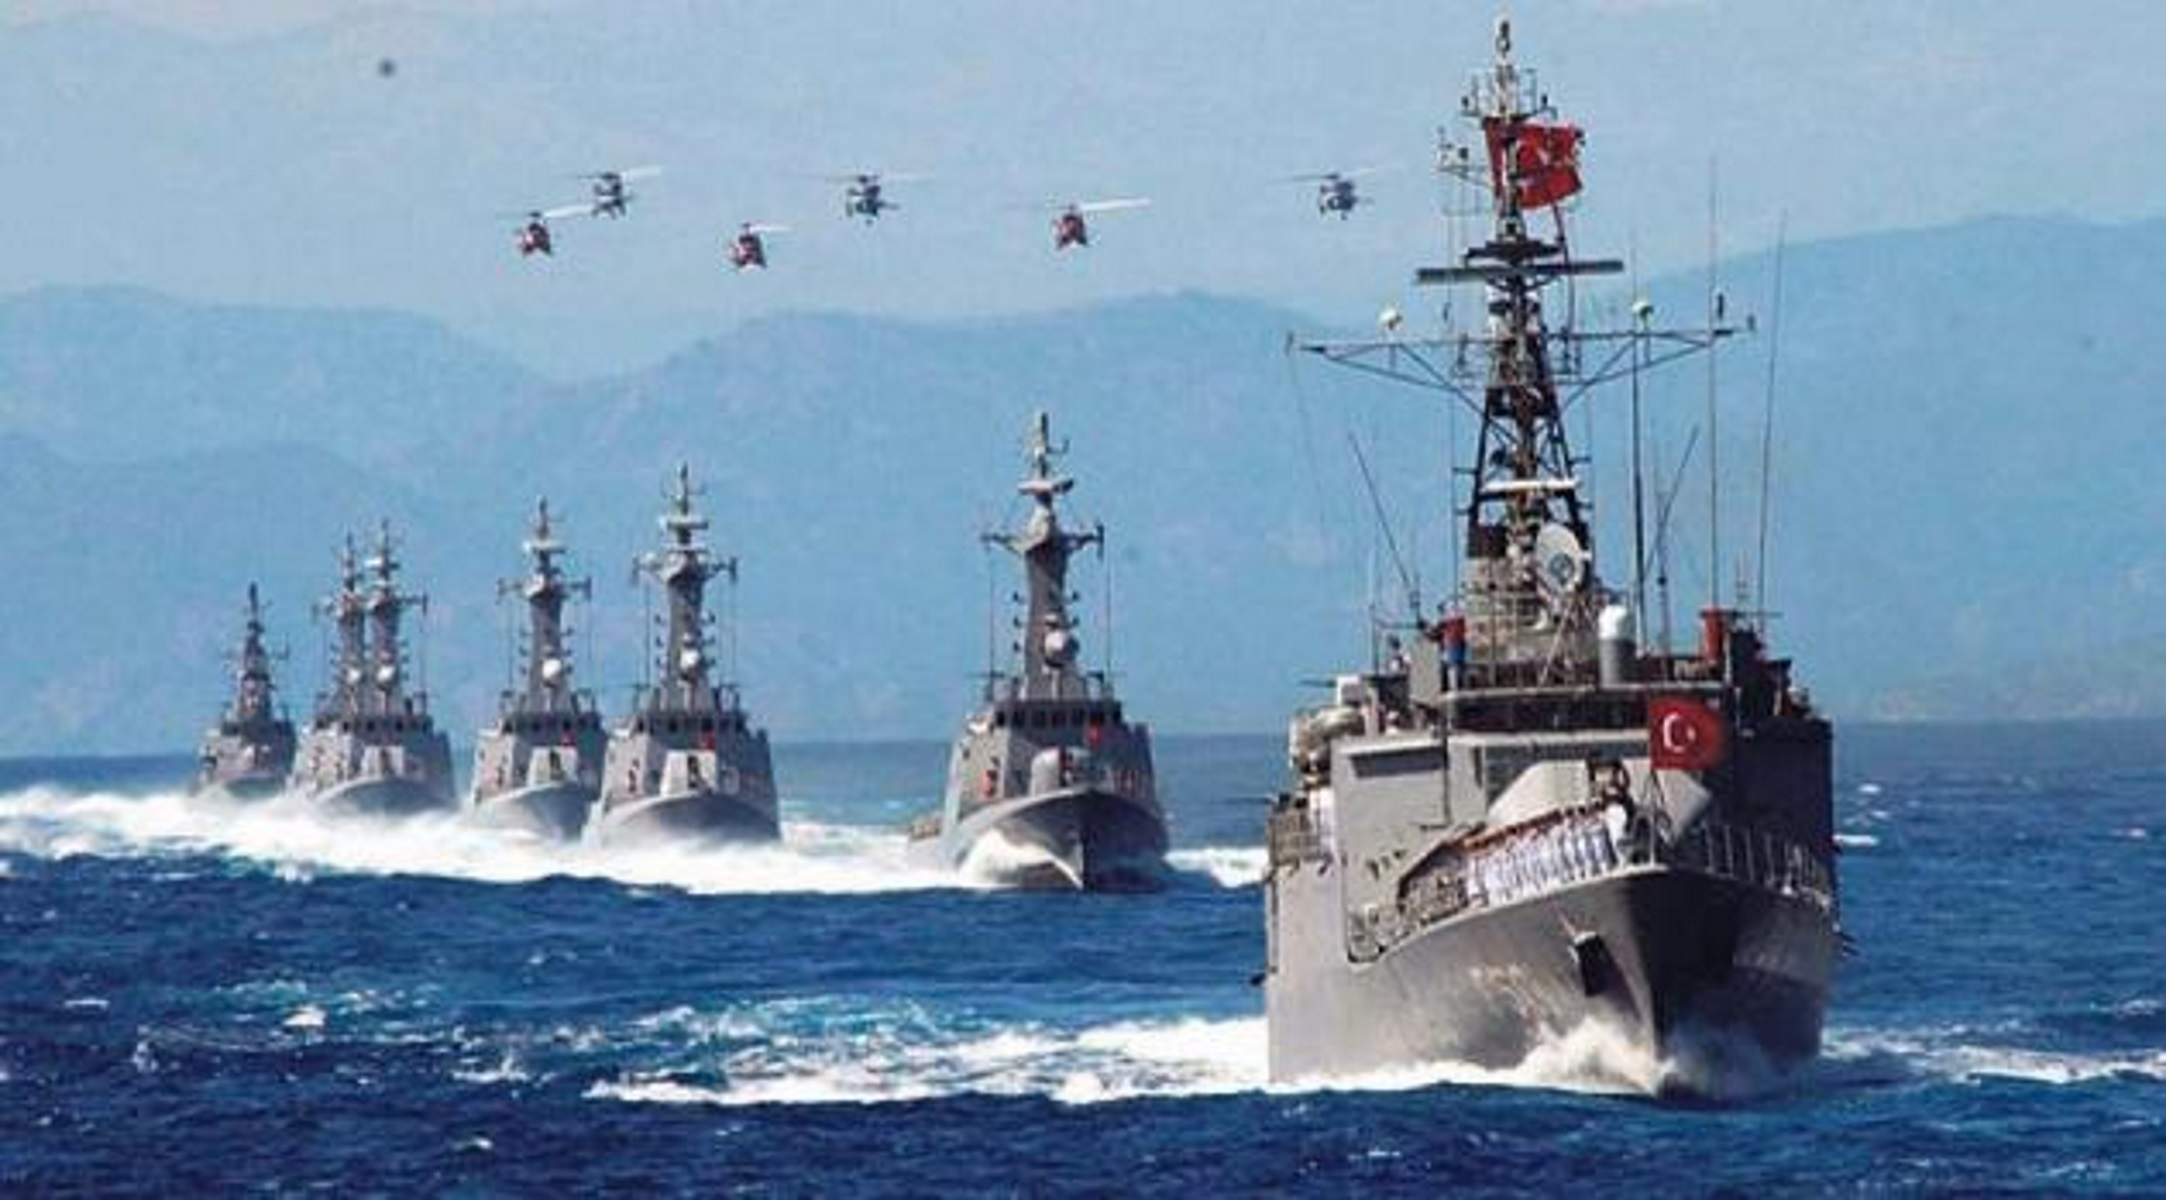 Yeni Safak: Ο ελληνικός στρατός ενεργοποίησε το σύστημα S-300 στην Κρήτη